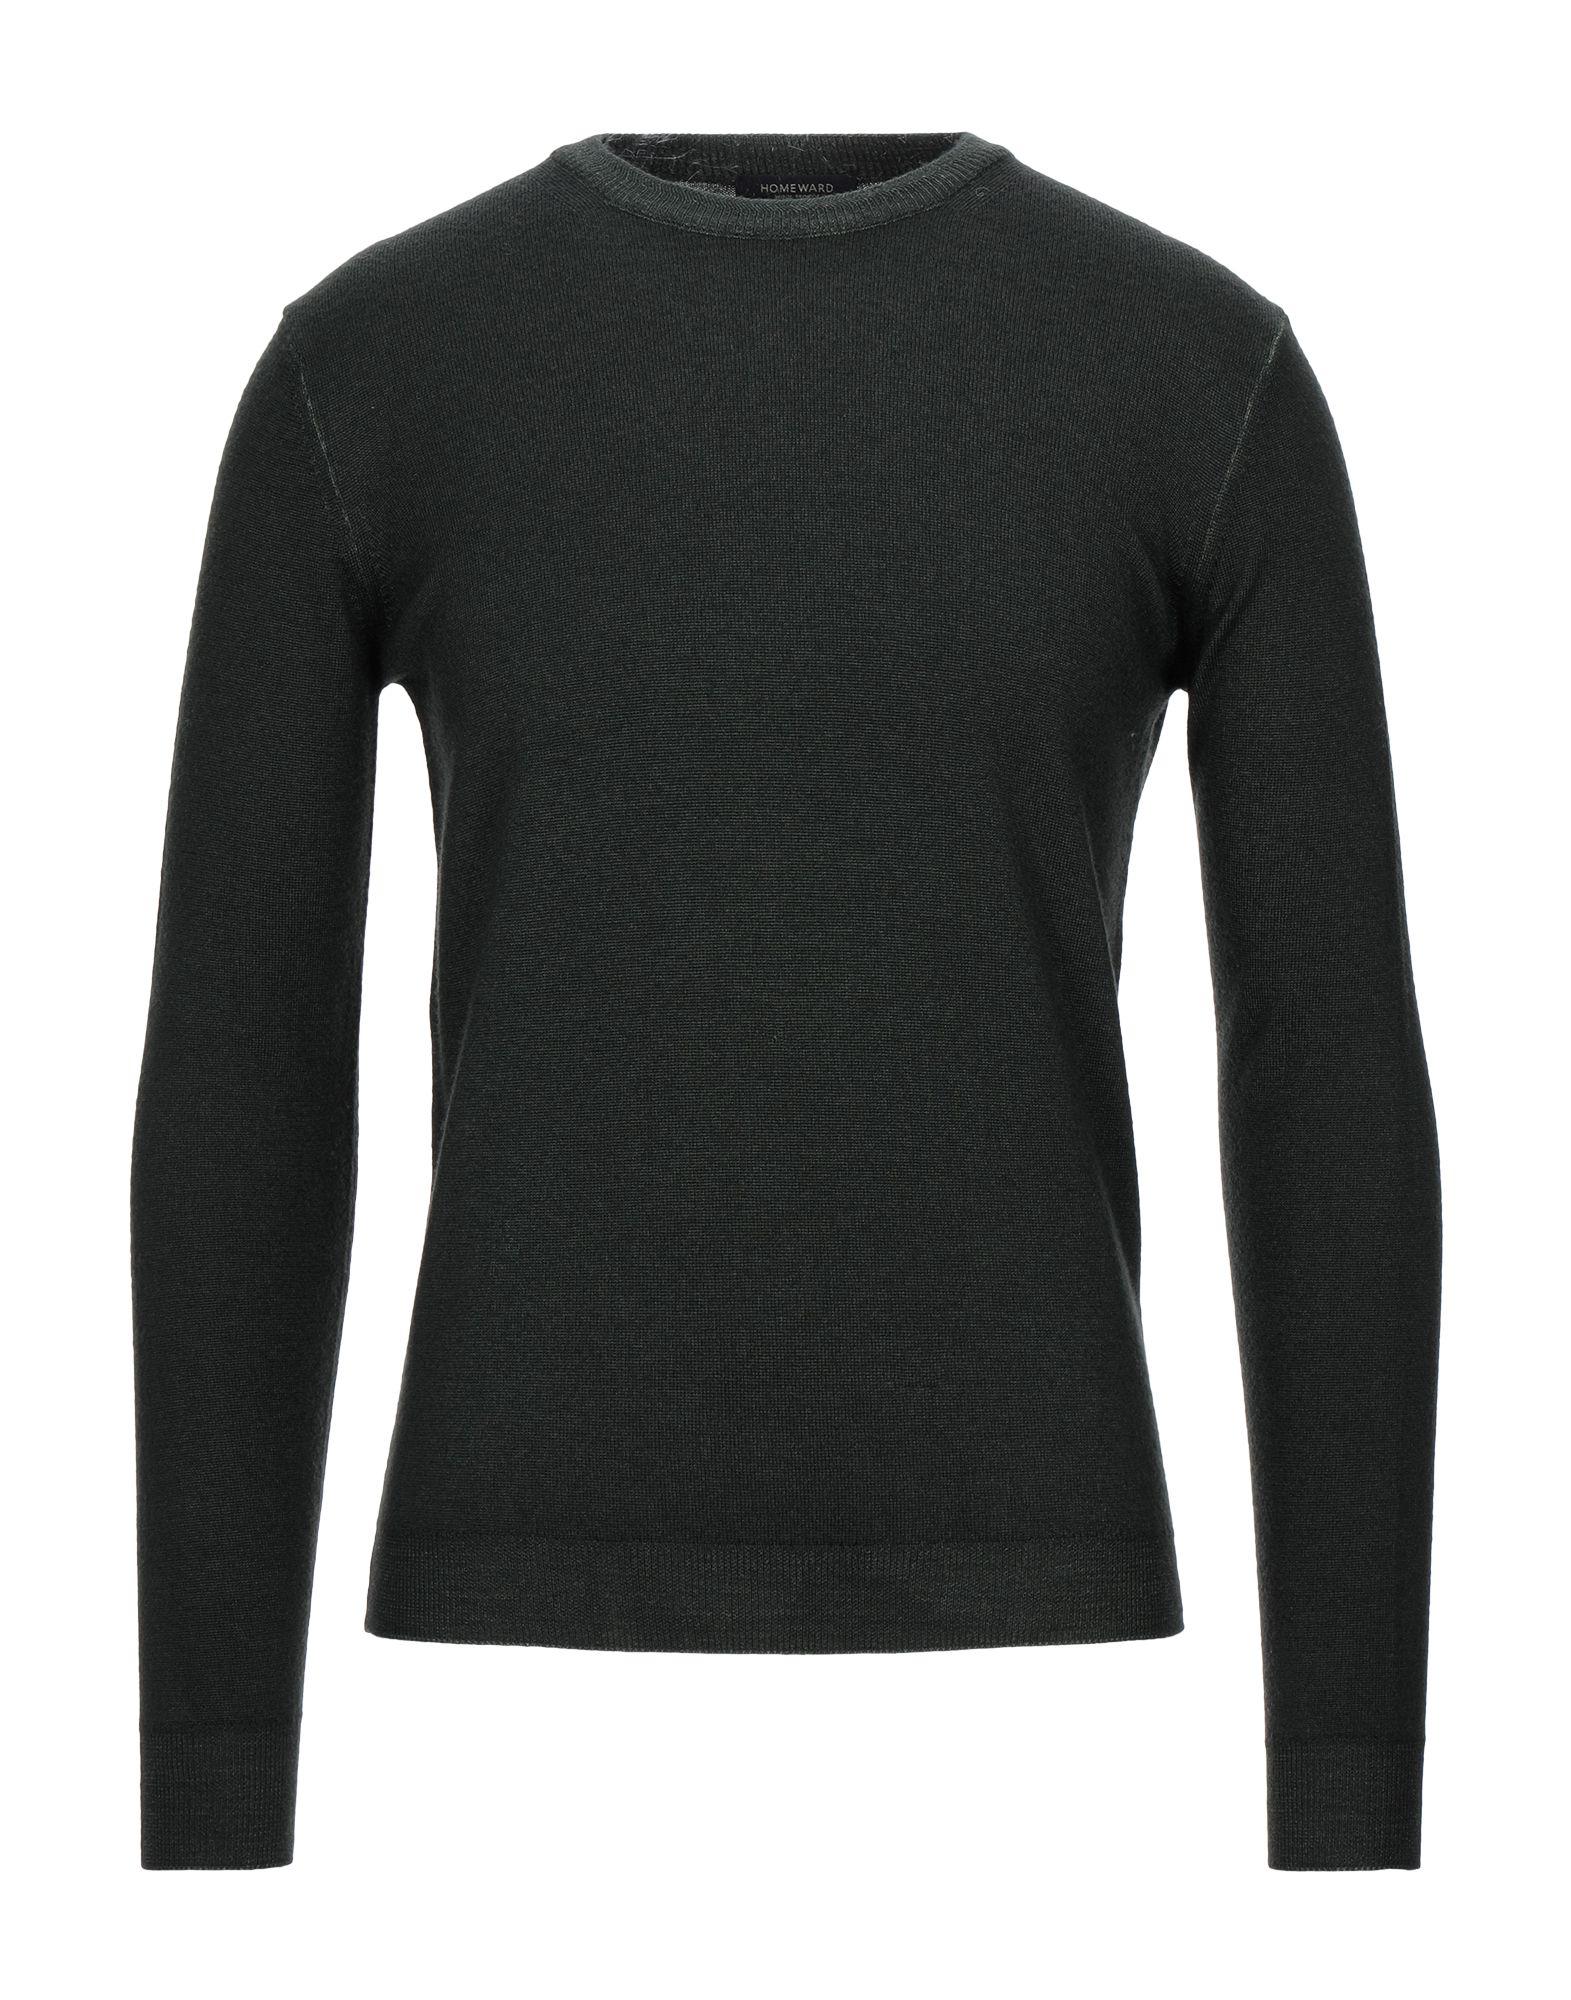 Фото - HOMEWARD CLOTHES Свитер bodysuits modis m182k00021 for baby boys kids clothes children clothes tmallfs